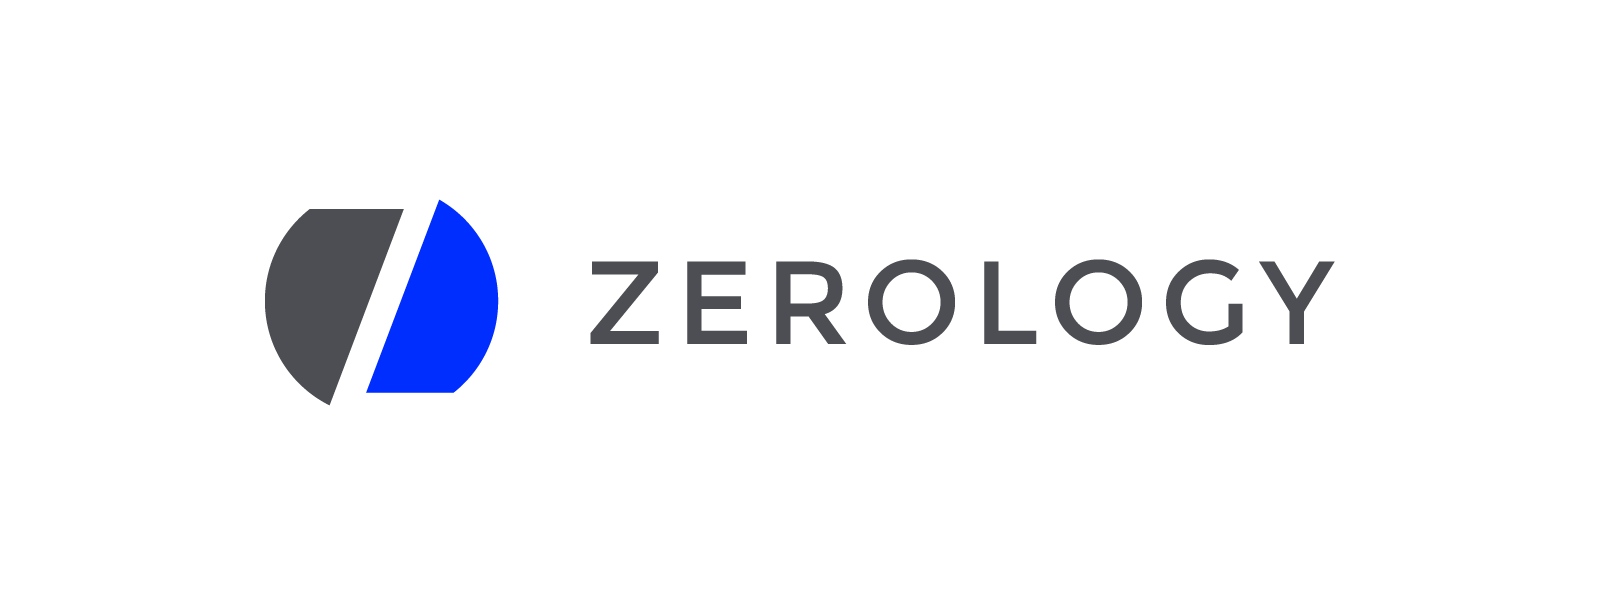 Zerology logo